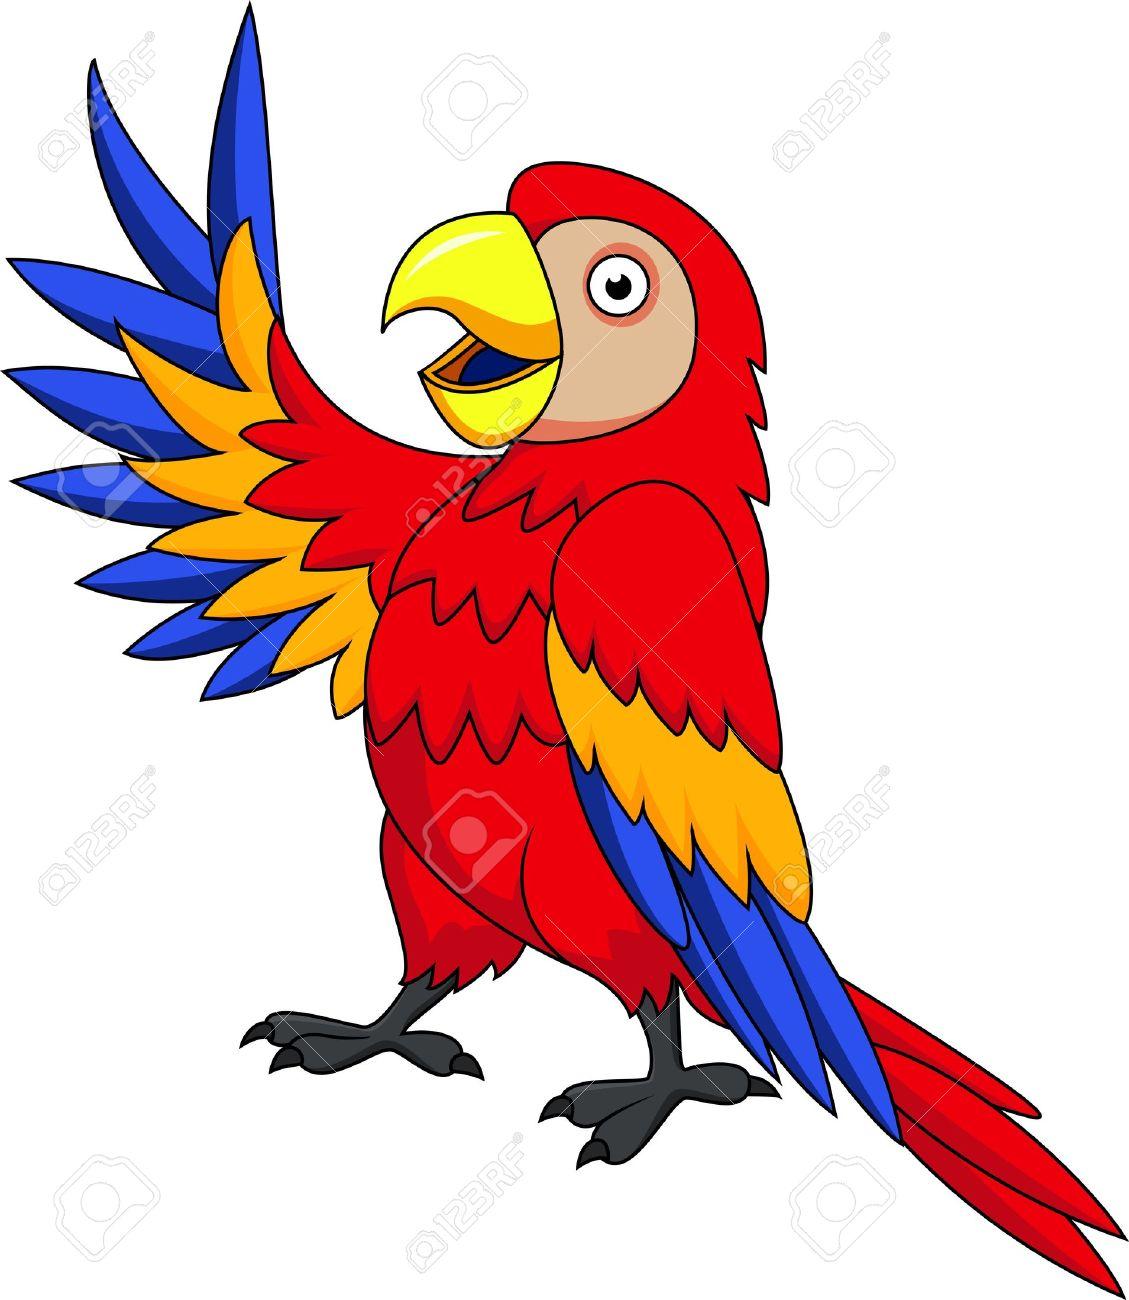 Macaw bird cartoon Stock Vector - 13393587